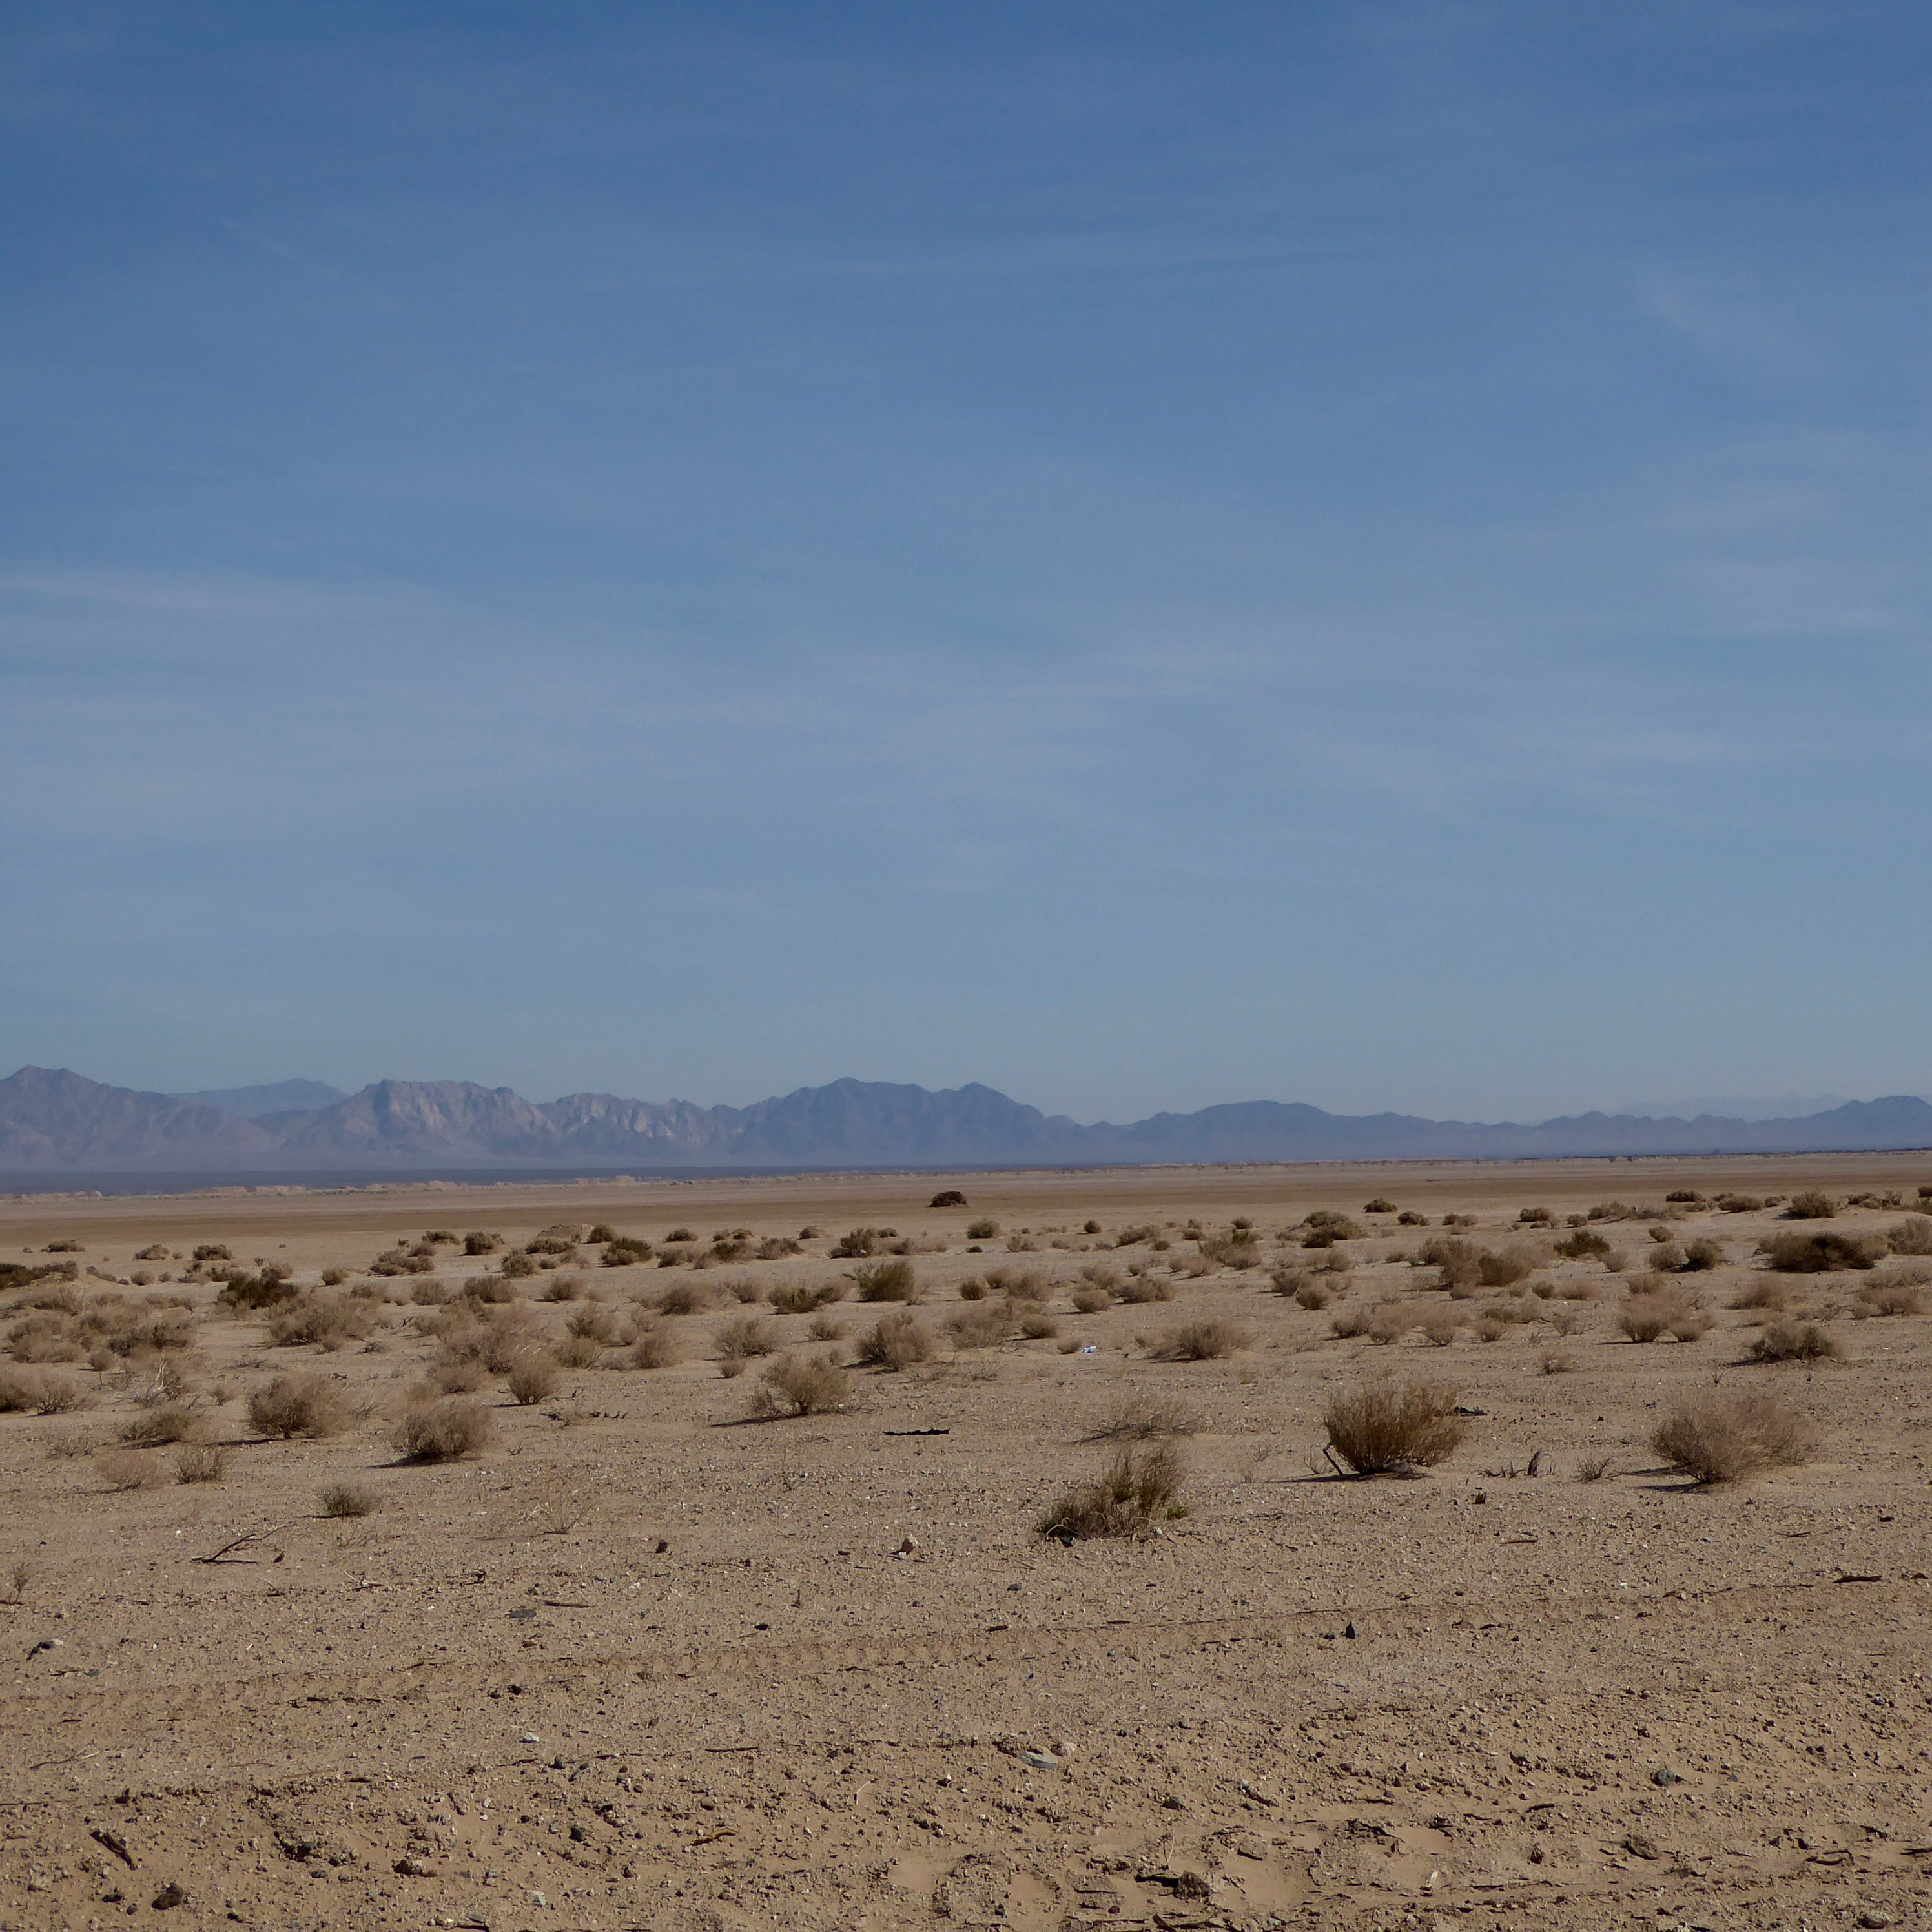 The Colorado Traveling Ducks Visit the Mojave Desert ...